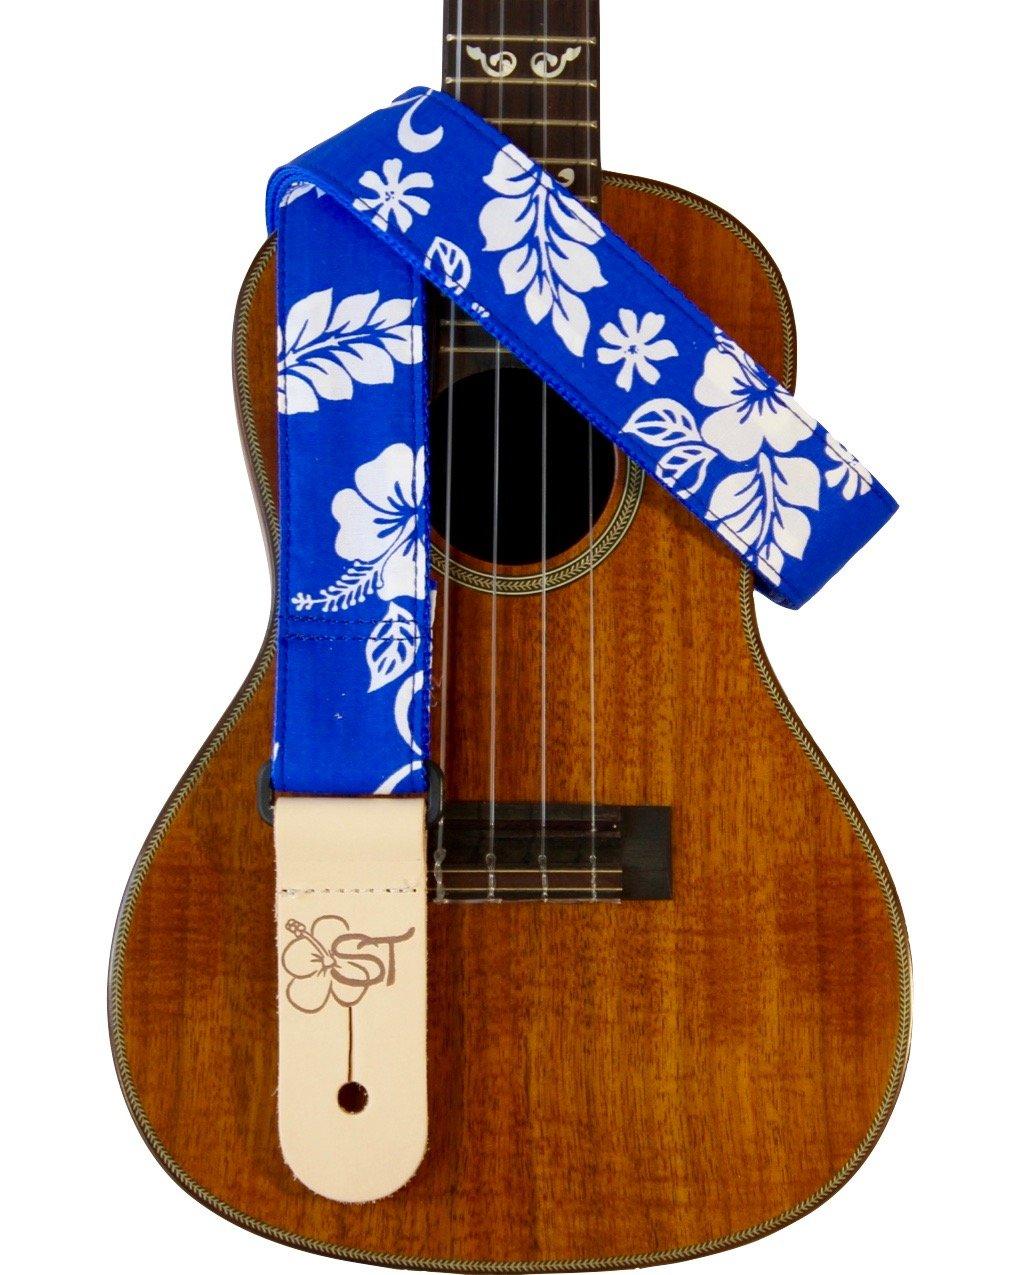 Sherrin's Threads 1.5 Hawaiian Print Ukulele Strap - Blue Hibiscus